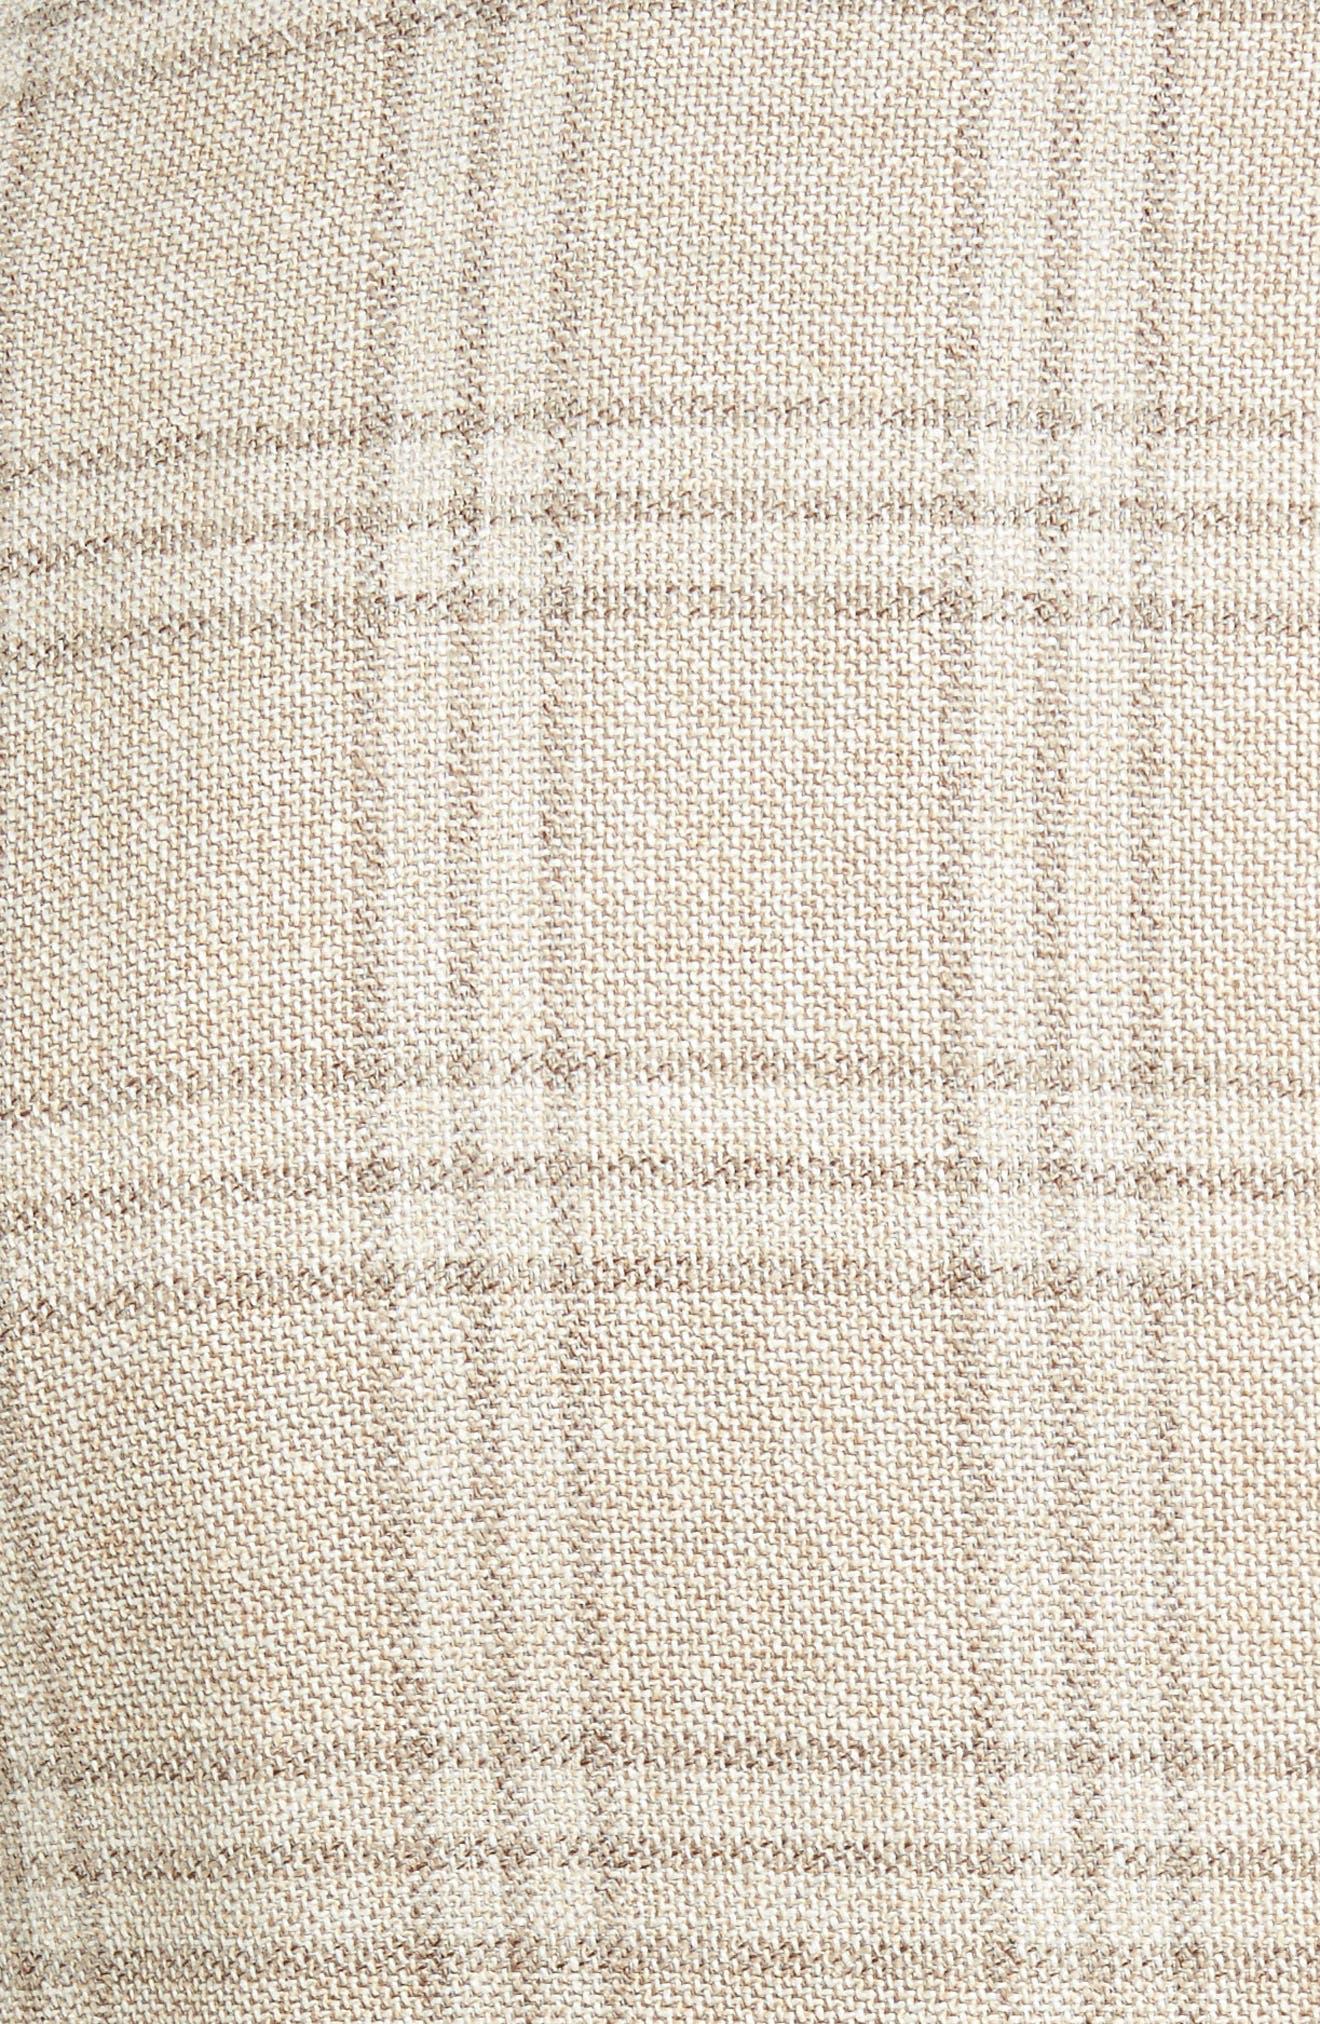 Plaid Wool Blend Sport Coat,                             Alternate thumbnail 5, color,                             Beige